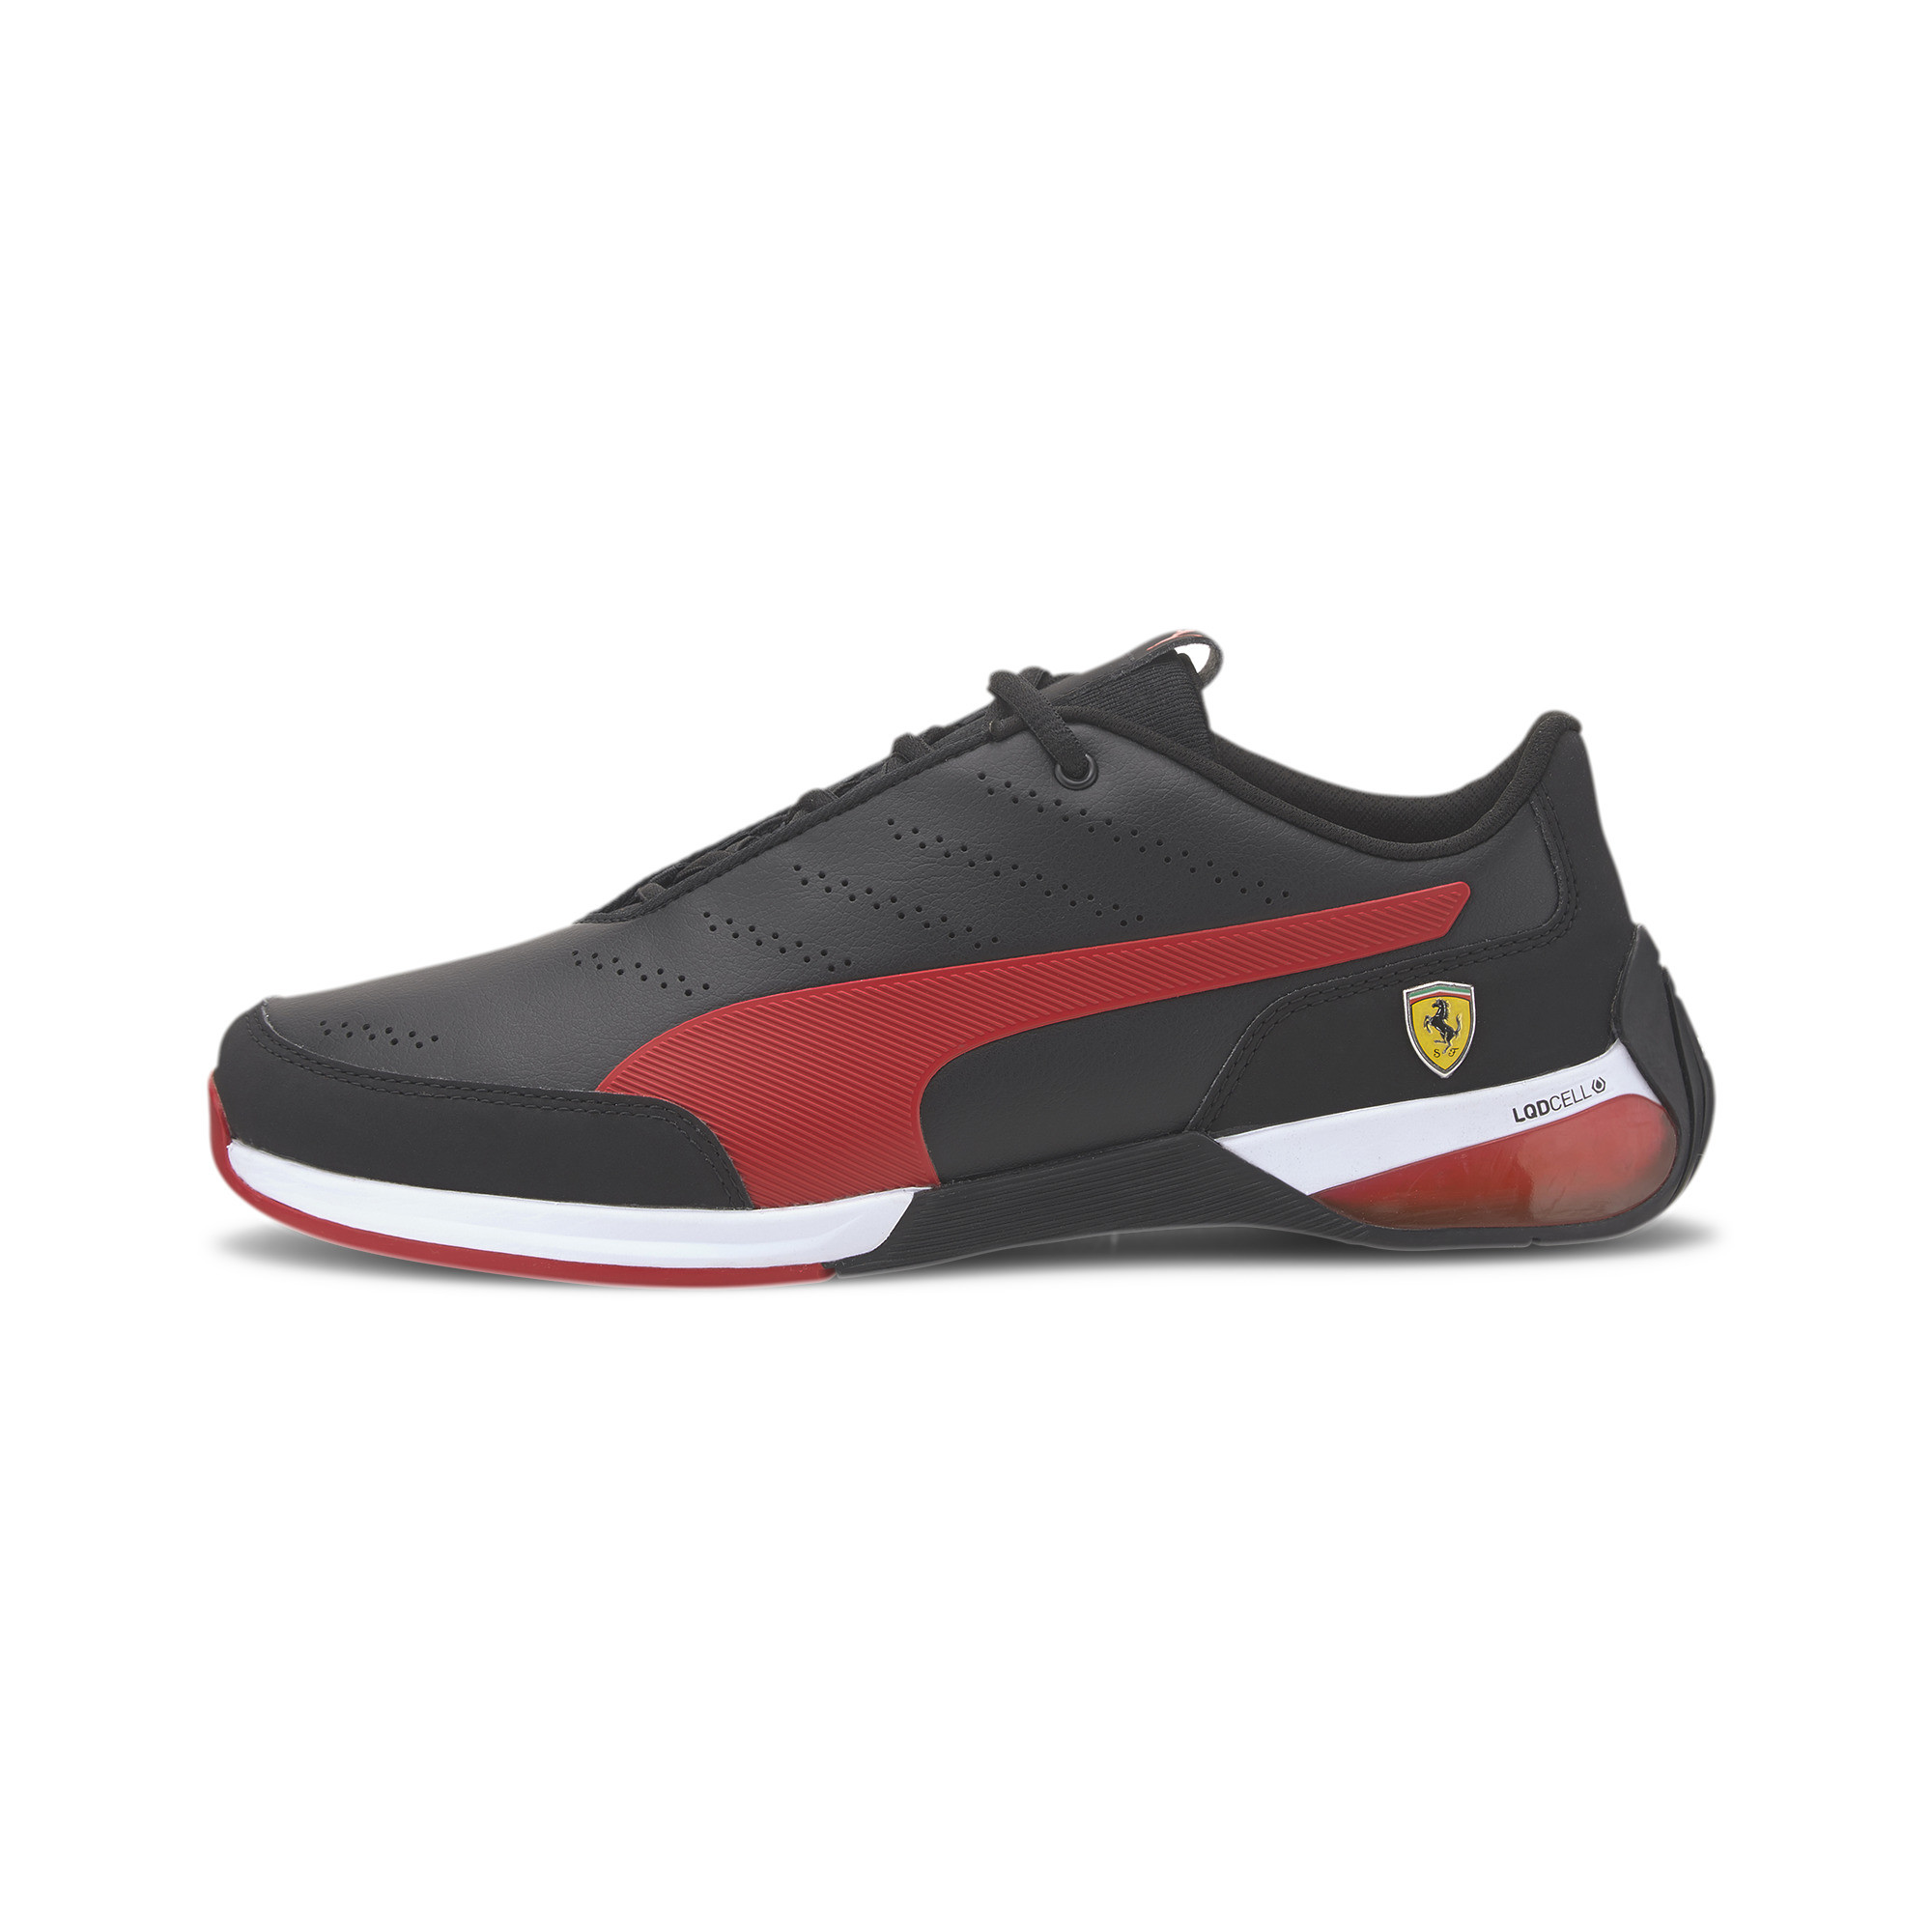 PUMA-Men-039-s-Scuderia-Ferrari-Kart-Cat-X-Motorsport-Shoes thumbnail 4